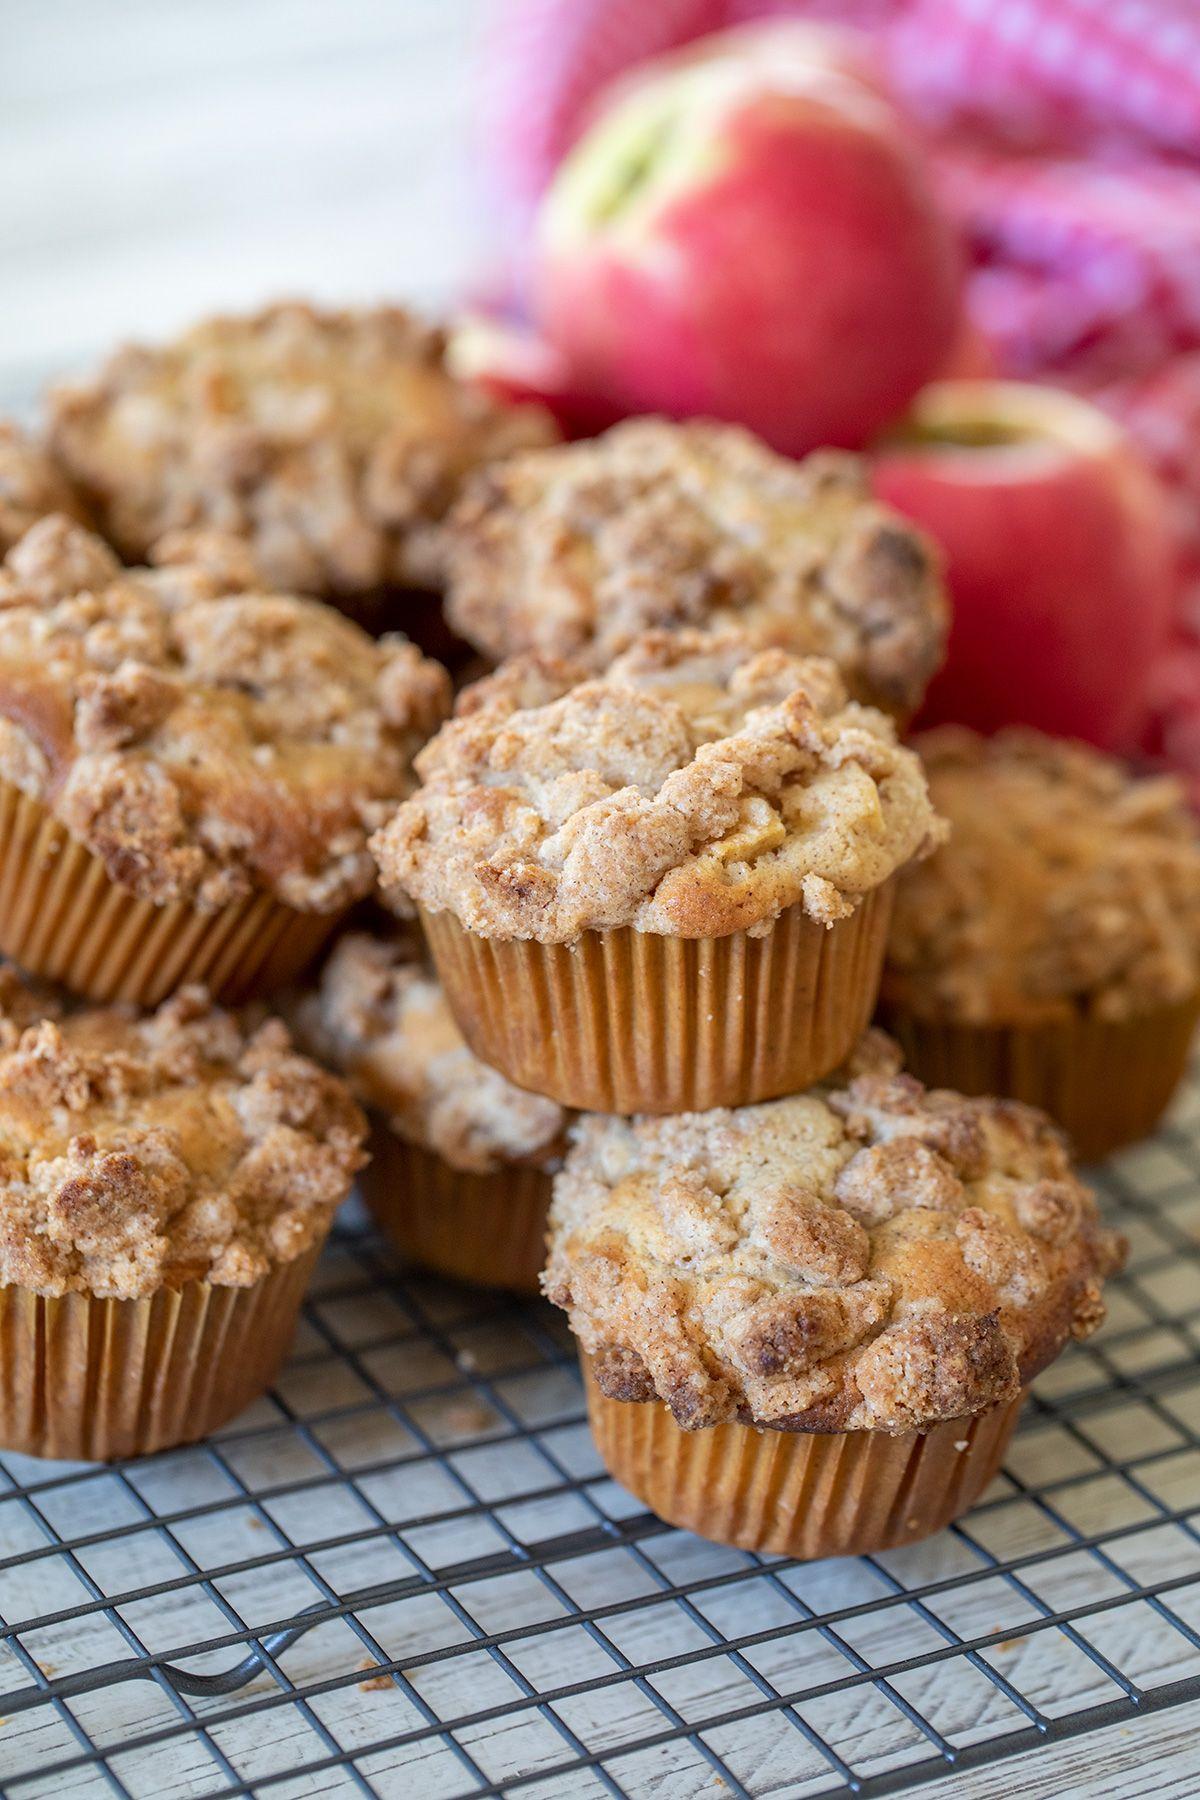 Apple Cinnamon Streusel Muffins In 2020 Cinnamon Streusel Muffins Muffin Streusel Apple Cinnamon Streusel Muffins